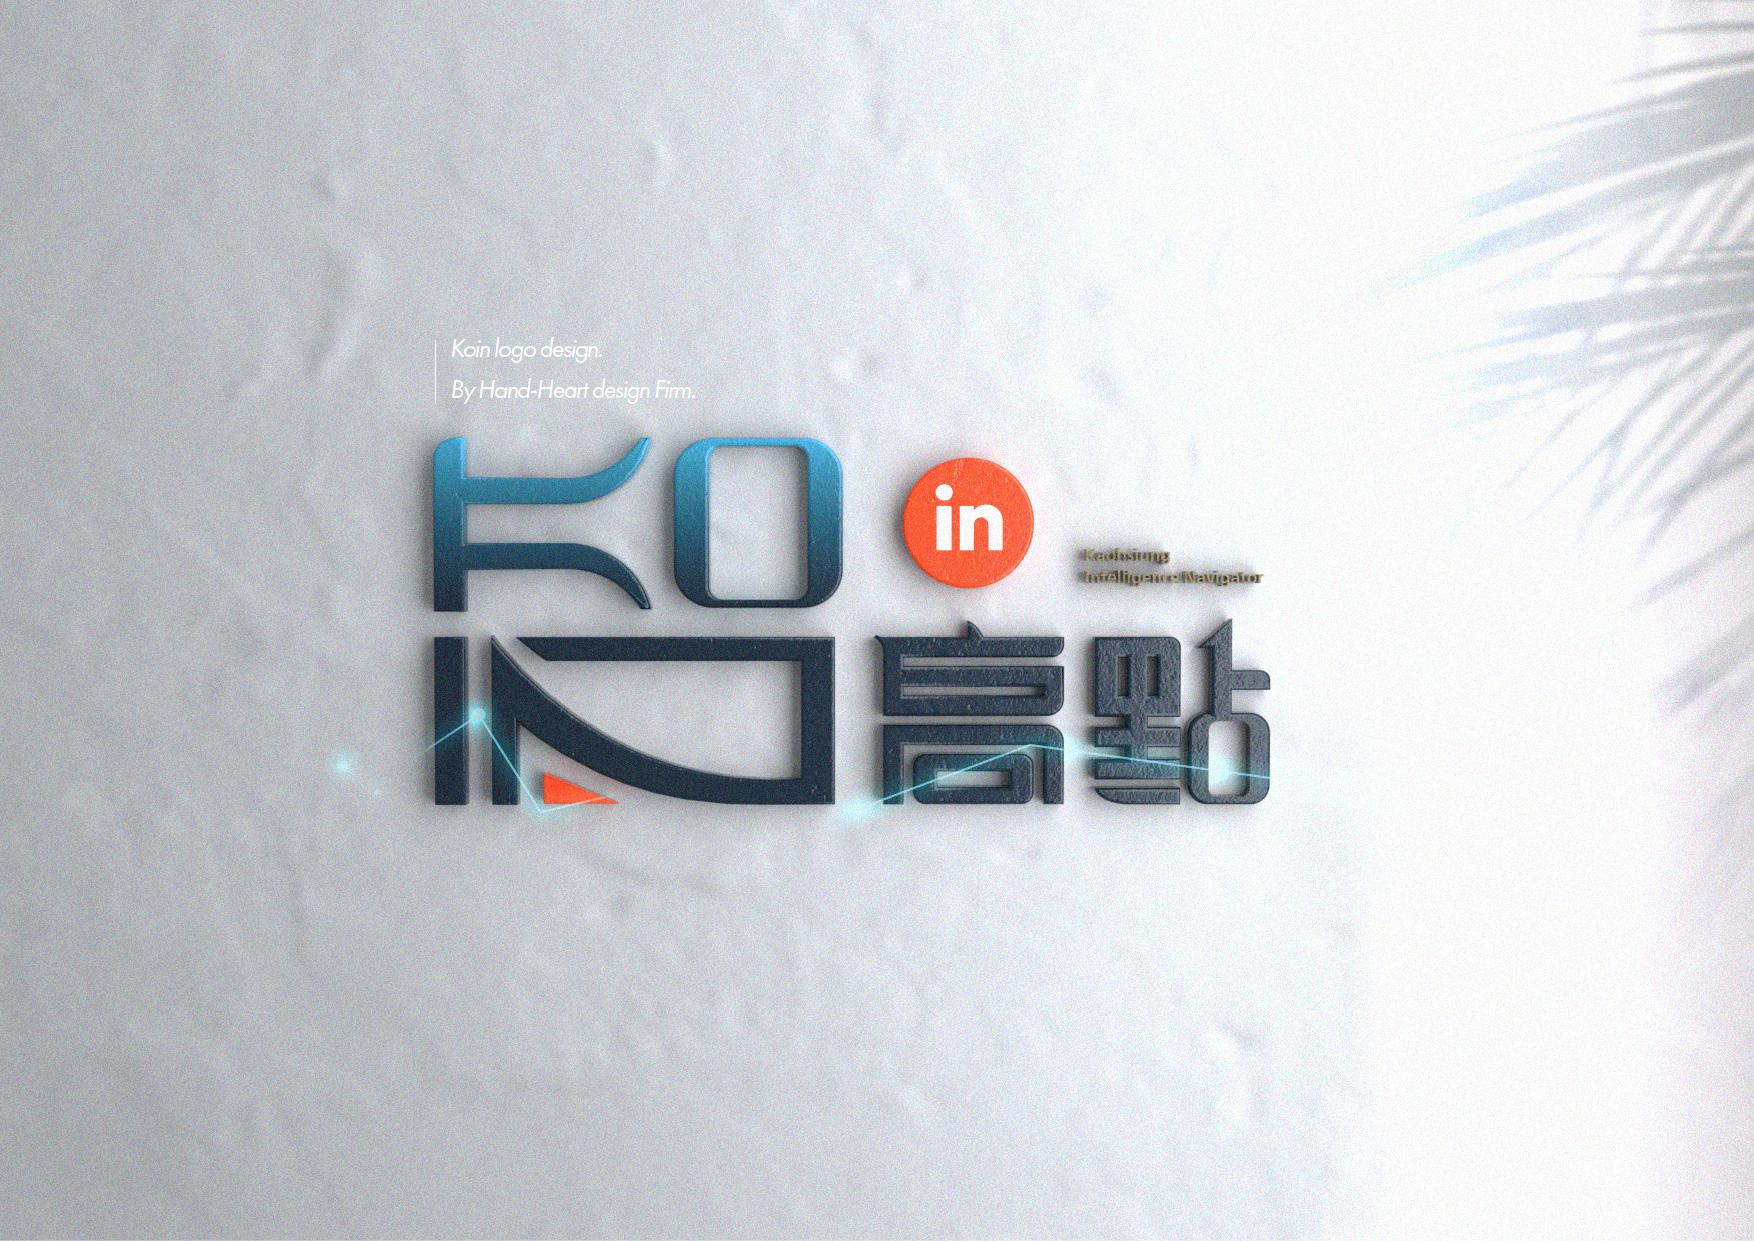 KO-IN智高點_品牌命名與LOGO設計_手心設計_1jpg